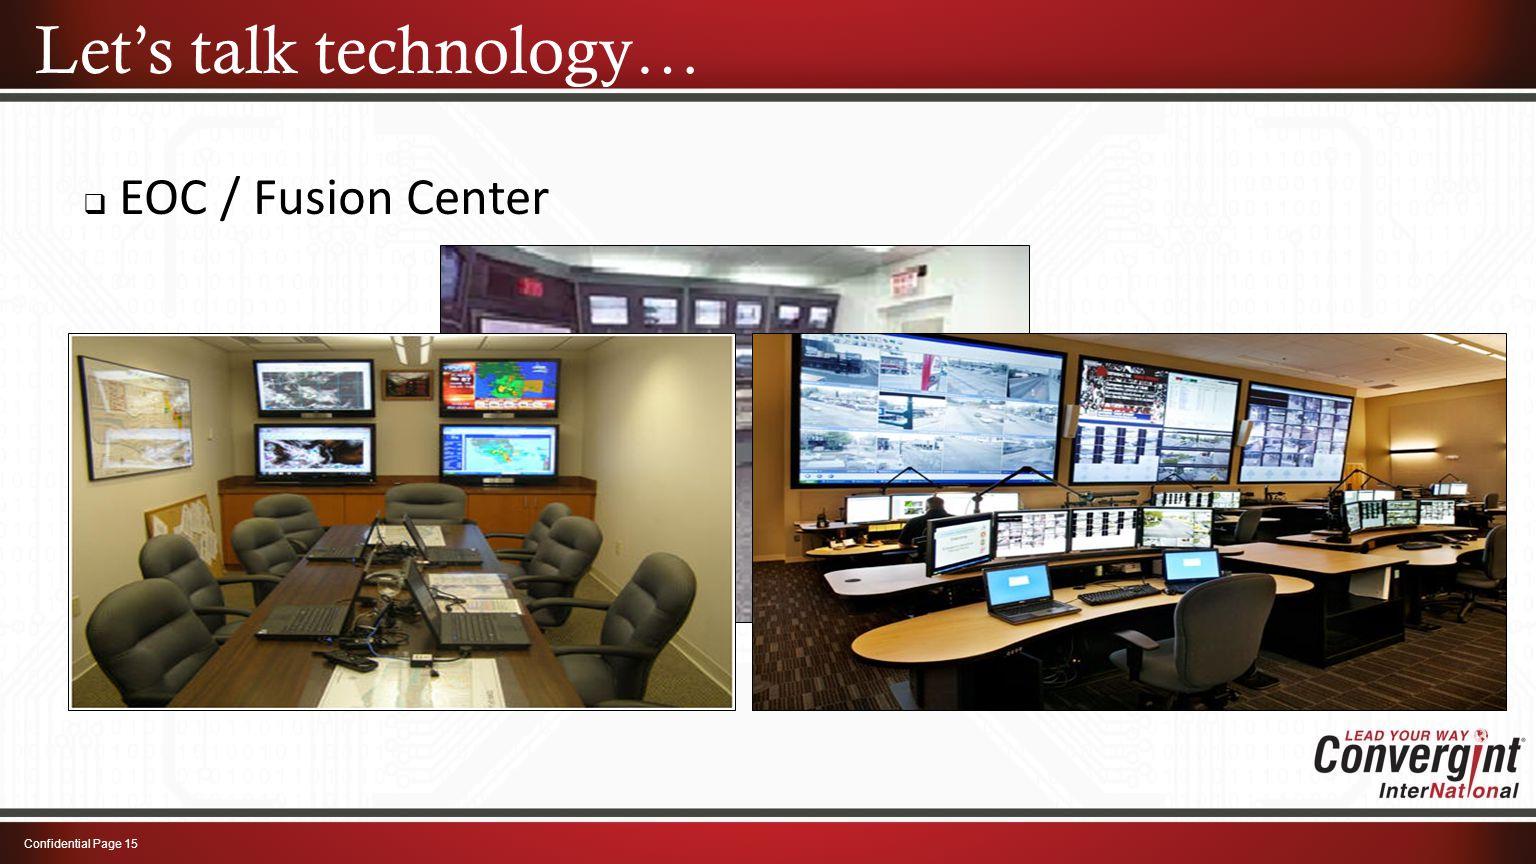  EOC / Fusion Center Confidential Page 15 Let's talk technology…